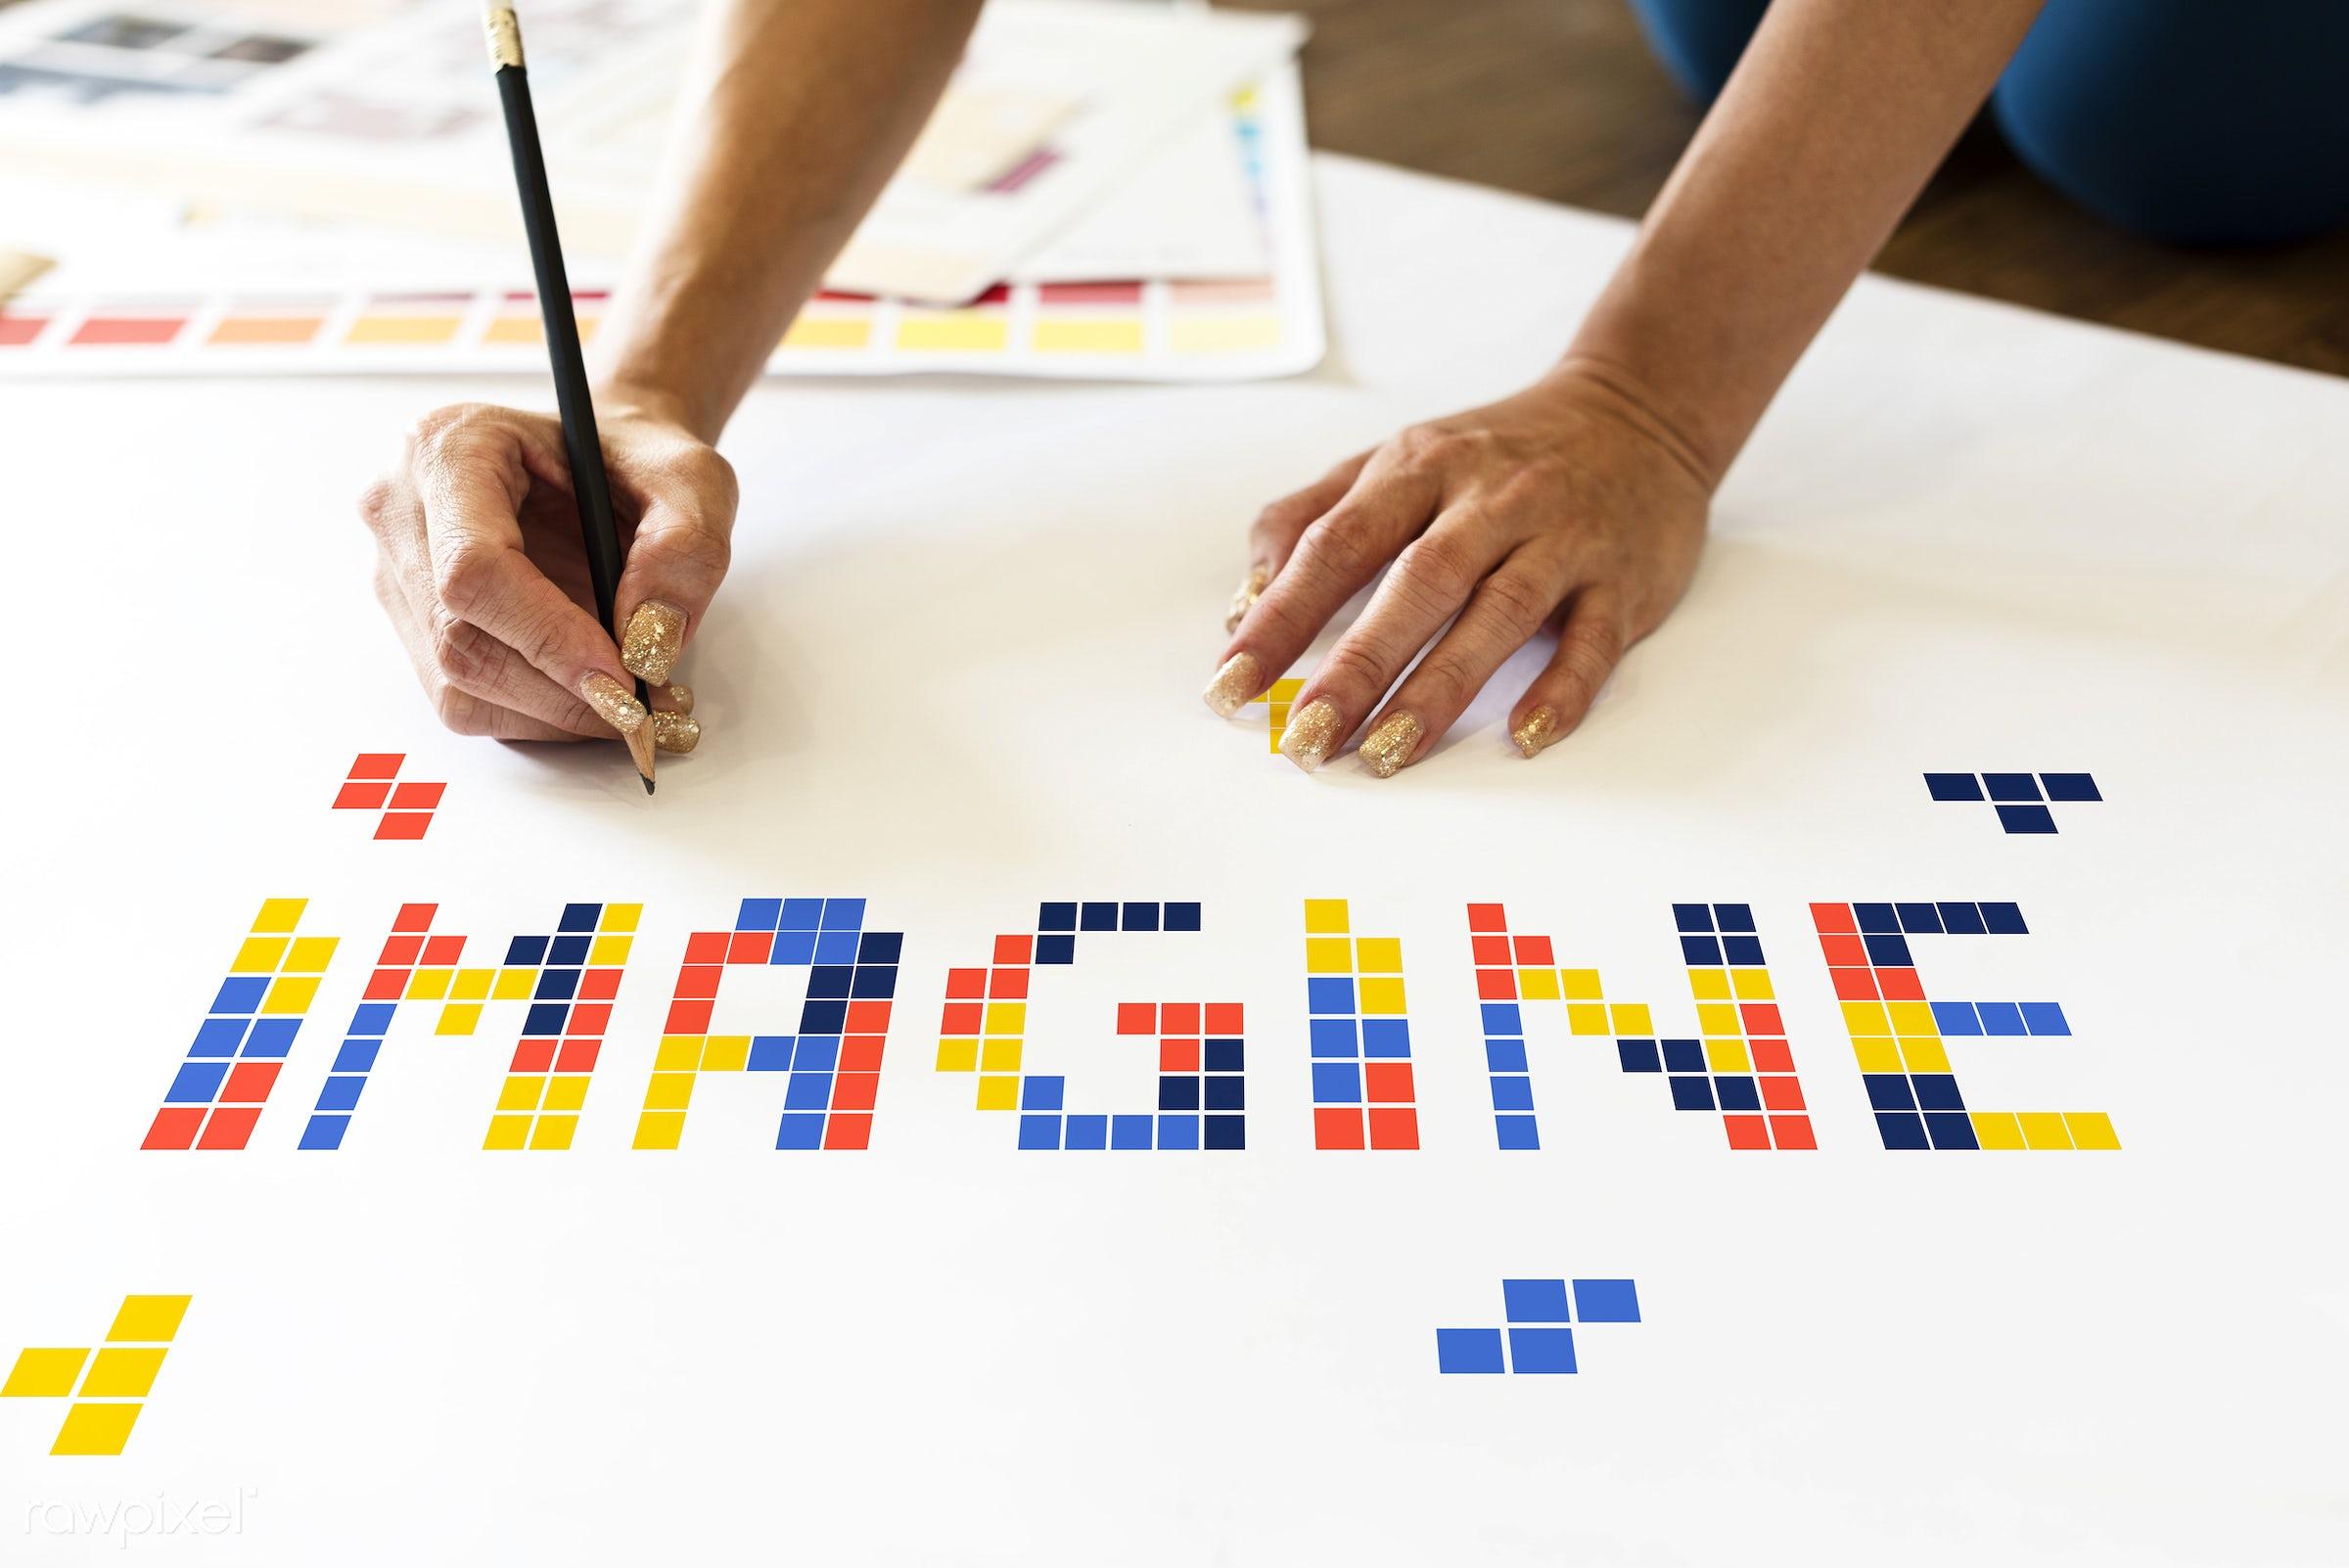 8 bit, art, artistry, block, creation, creative, creativity, design, drawing, game, graphic, graphics, hands, ideas,...